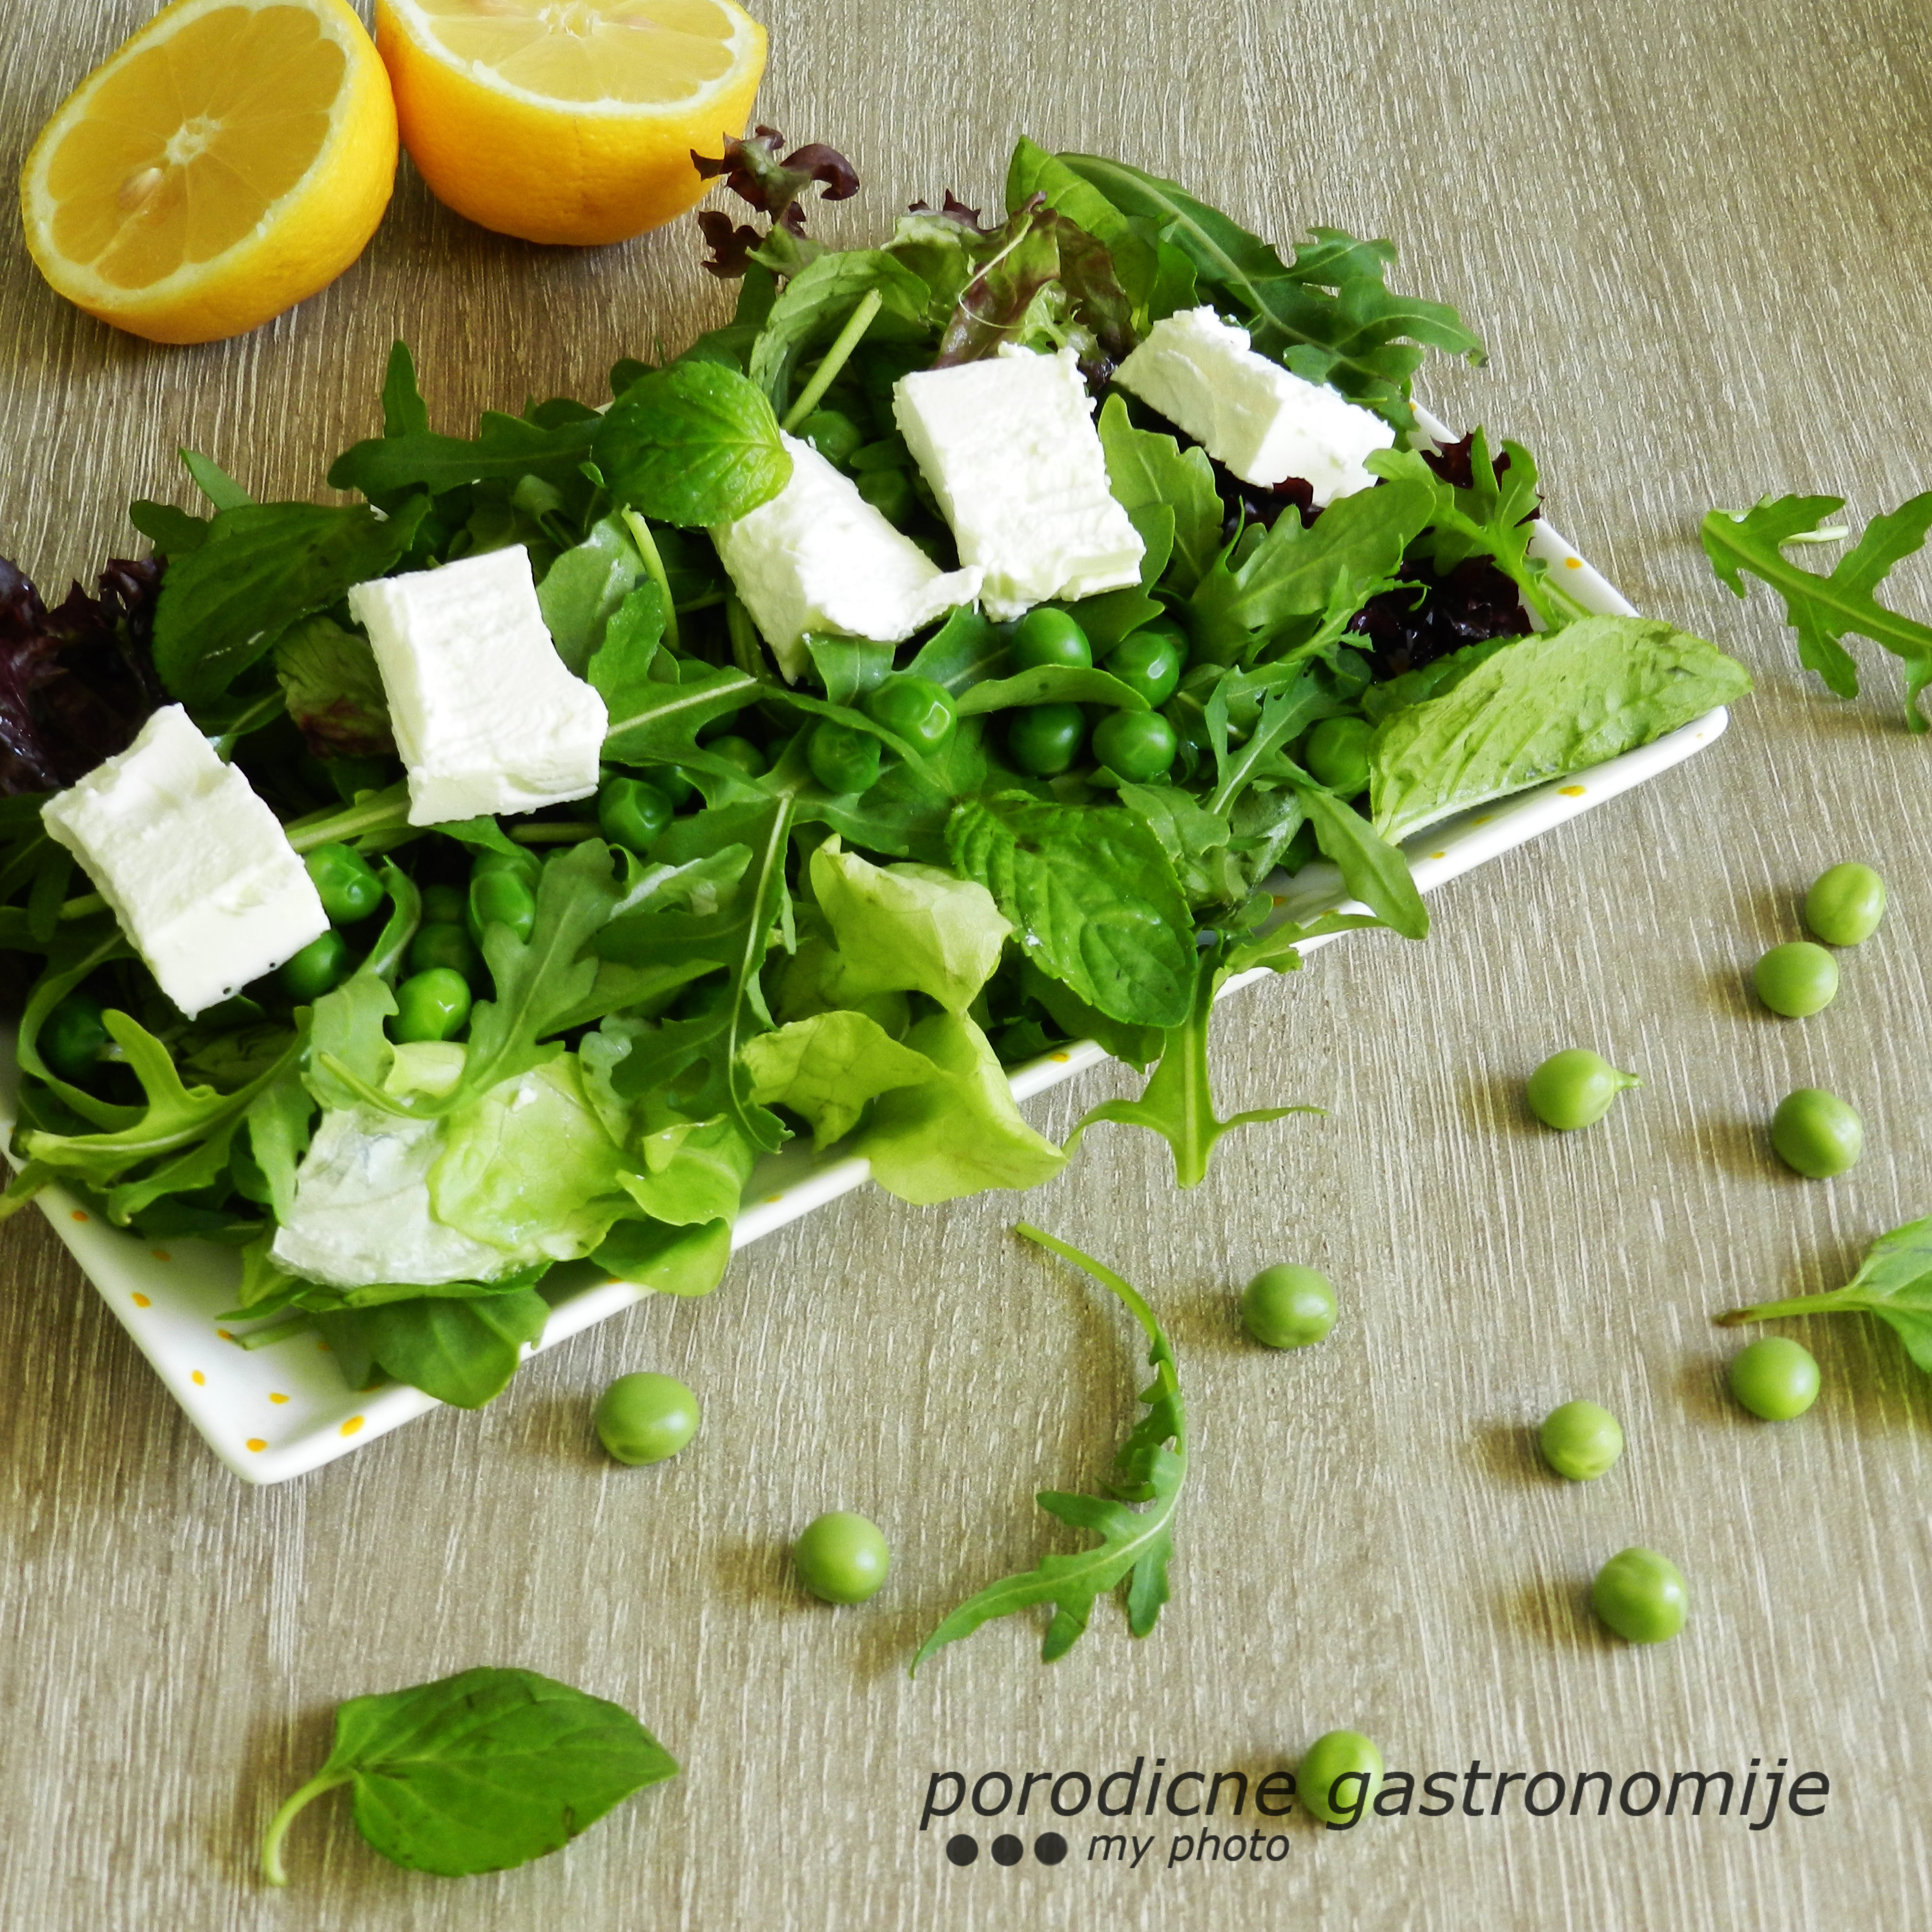 salata od graska3 sa wm